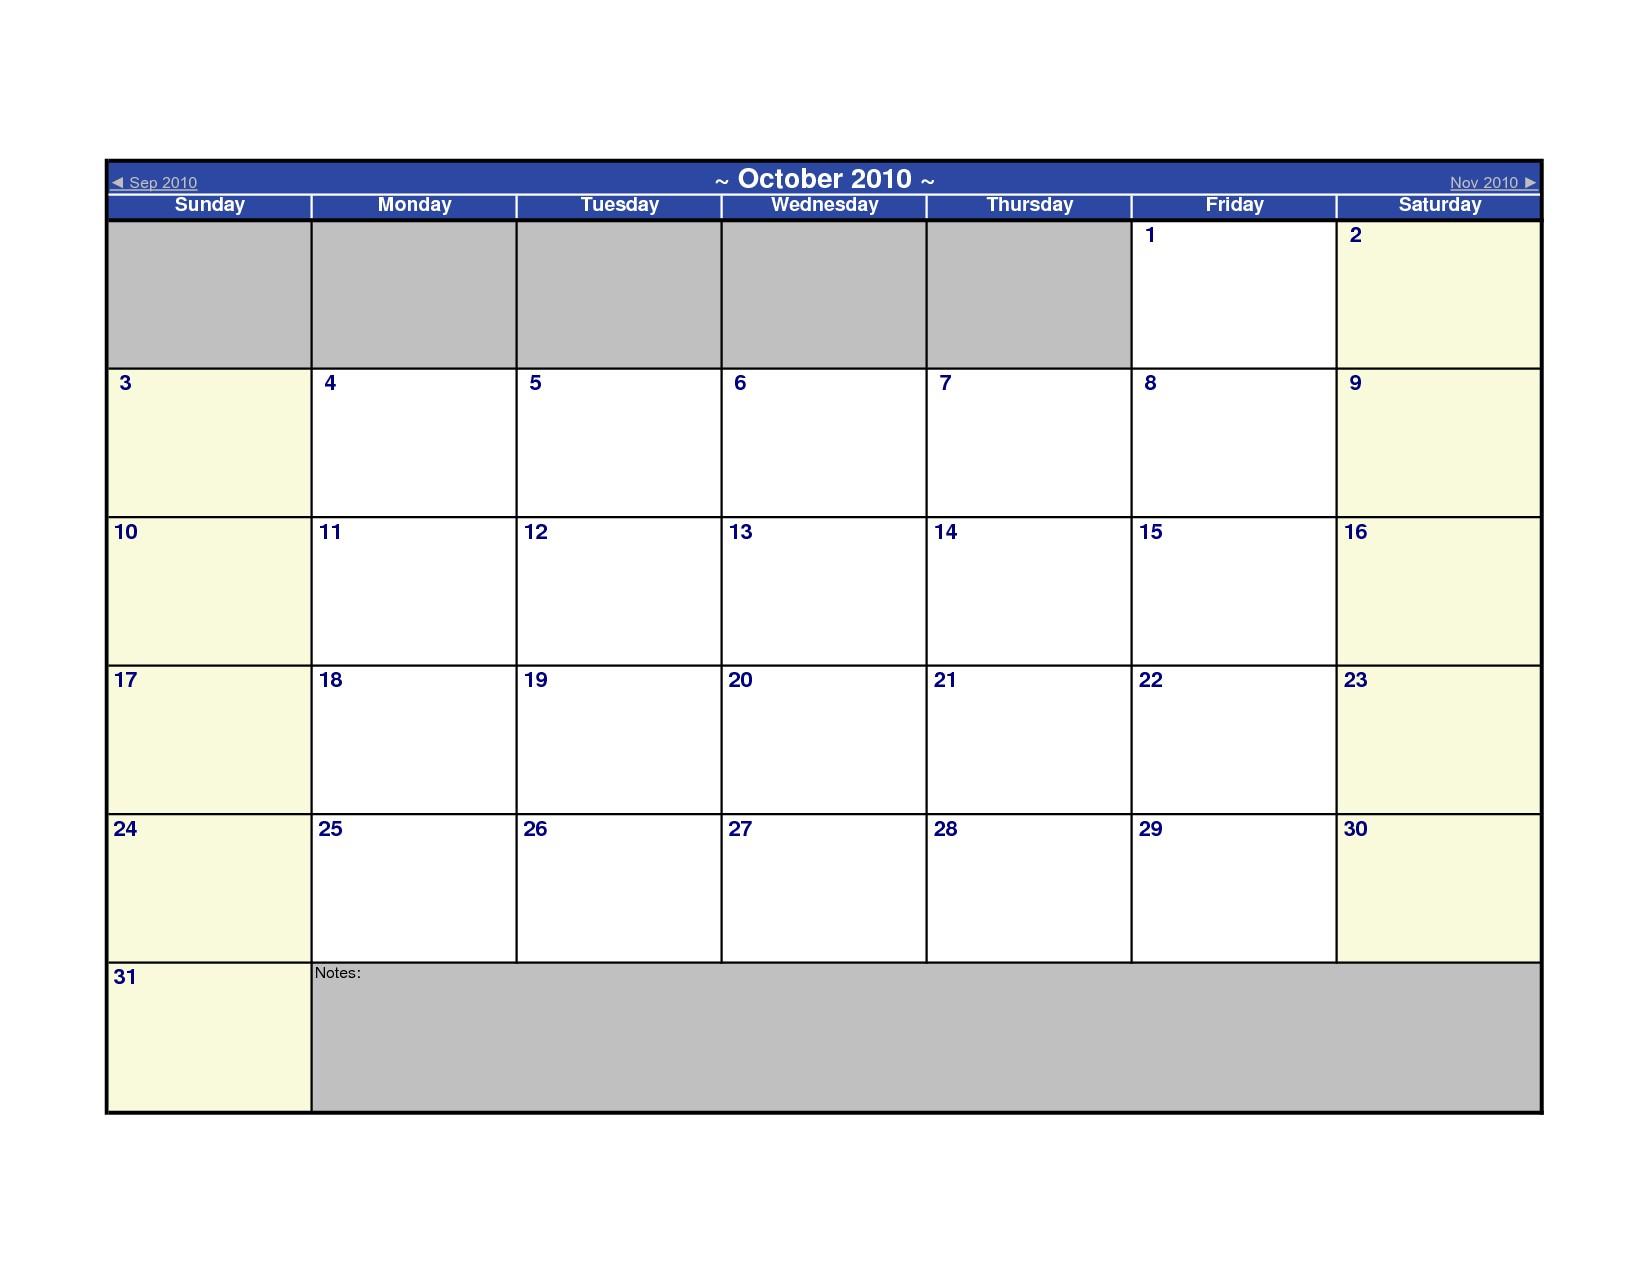 006 Microsoft Word Calendar Template Ctdexoeq In Top Ideas April